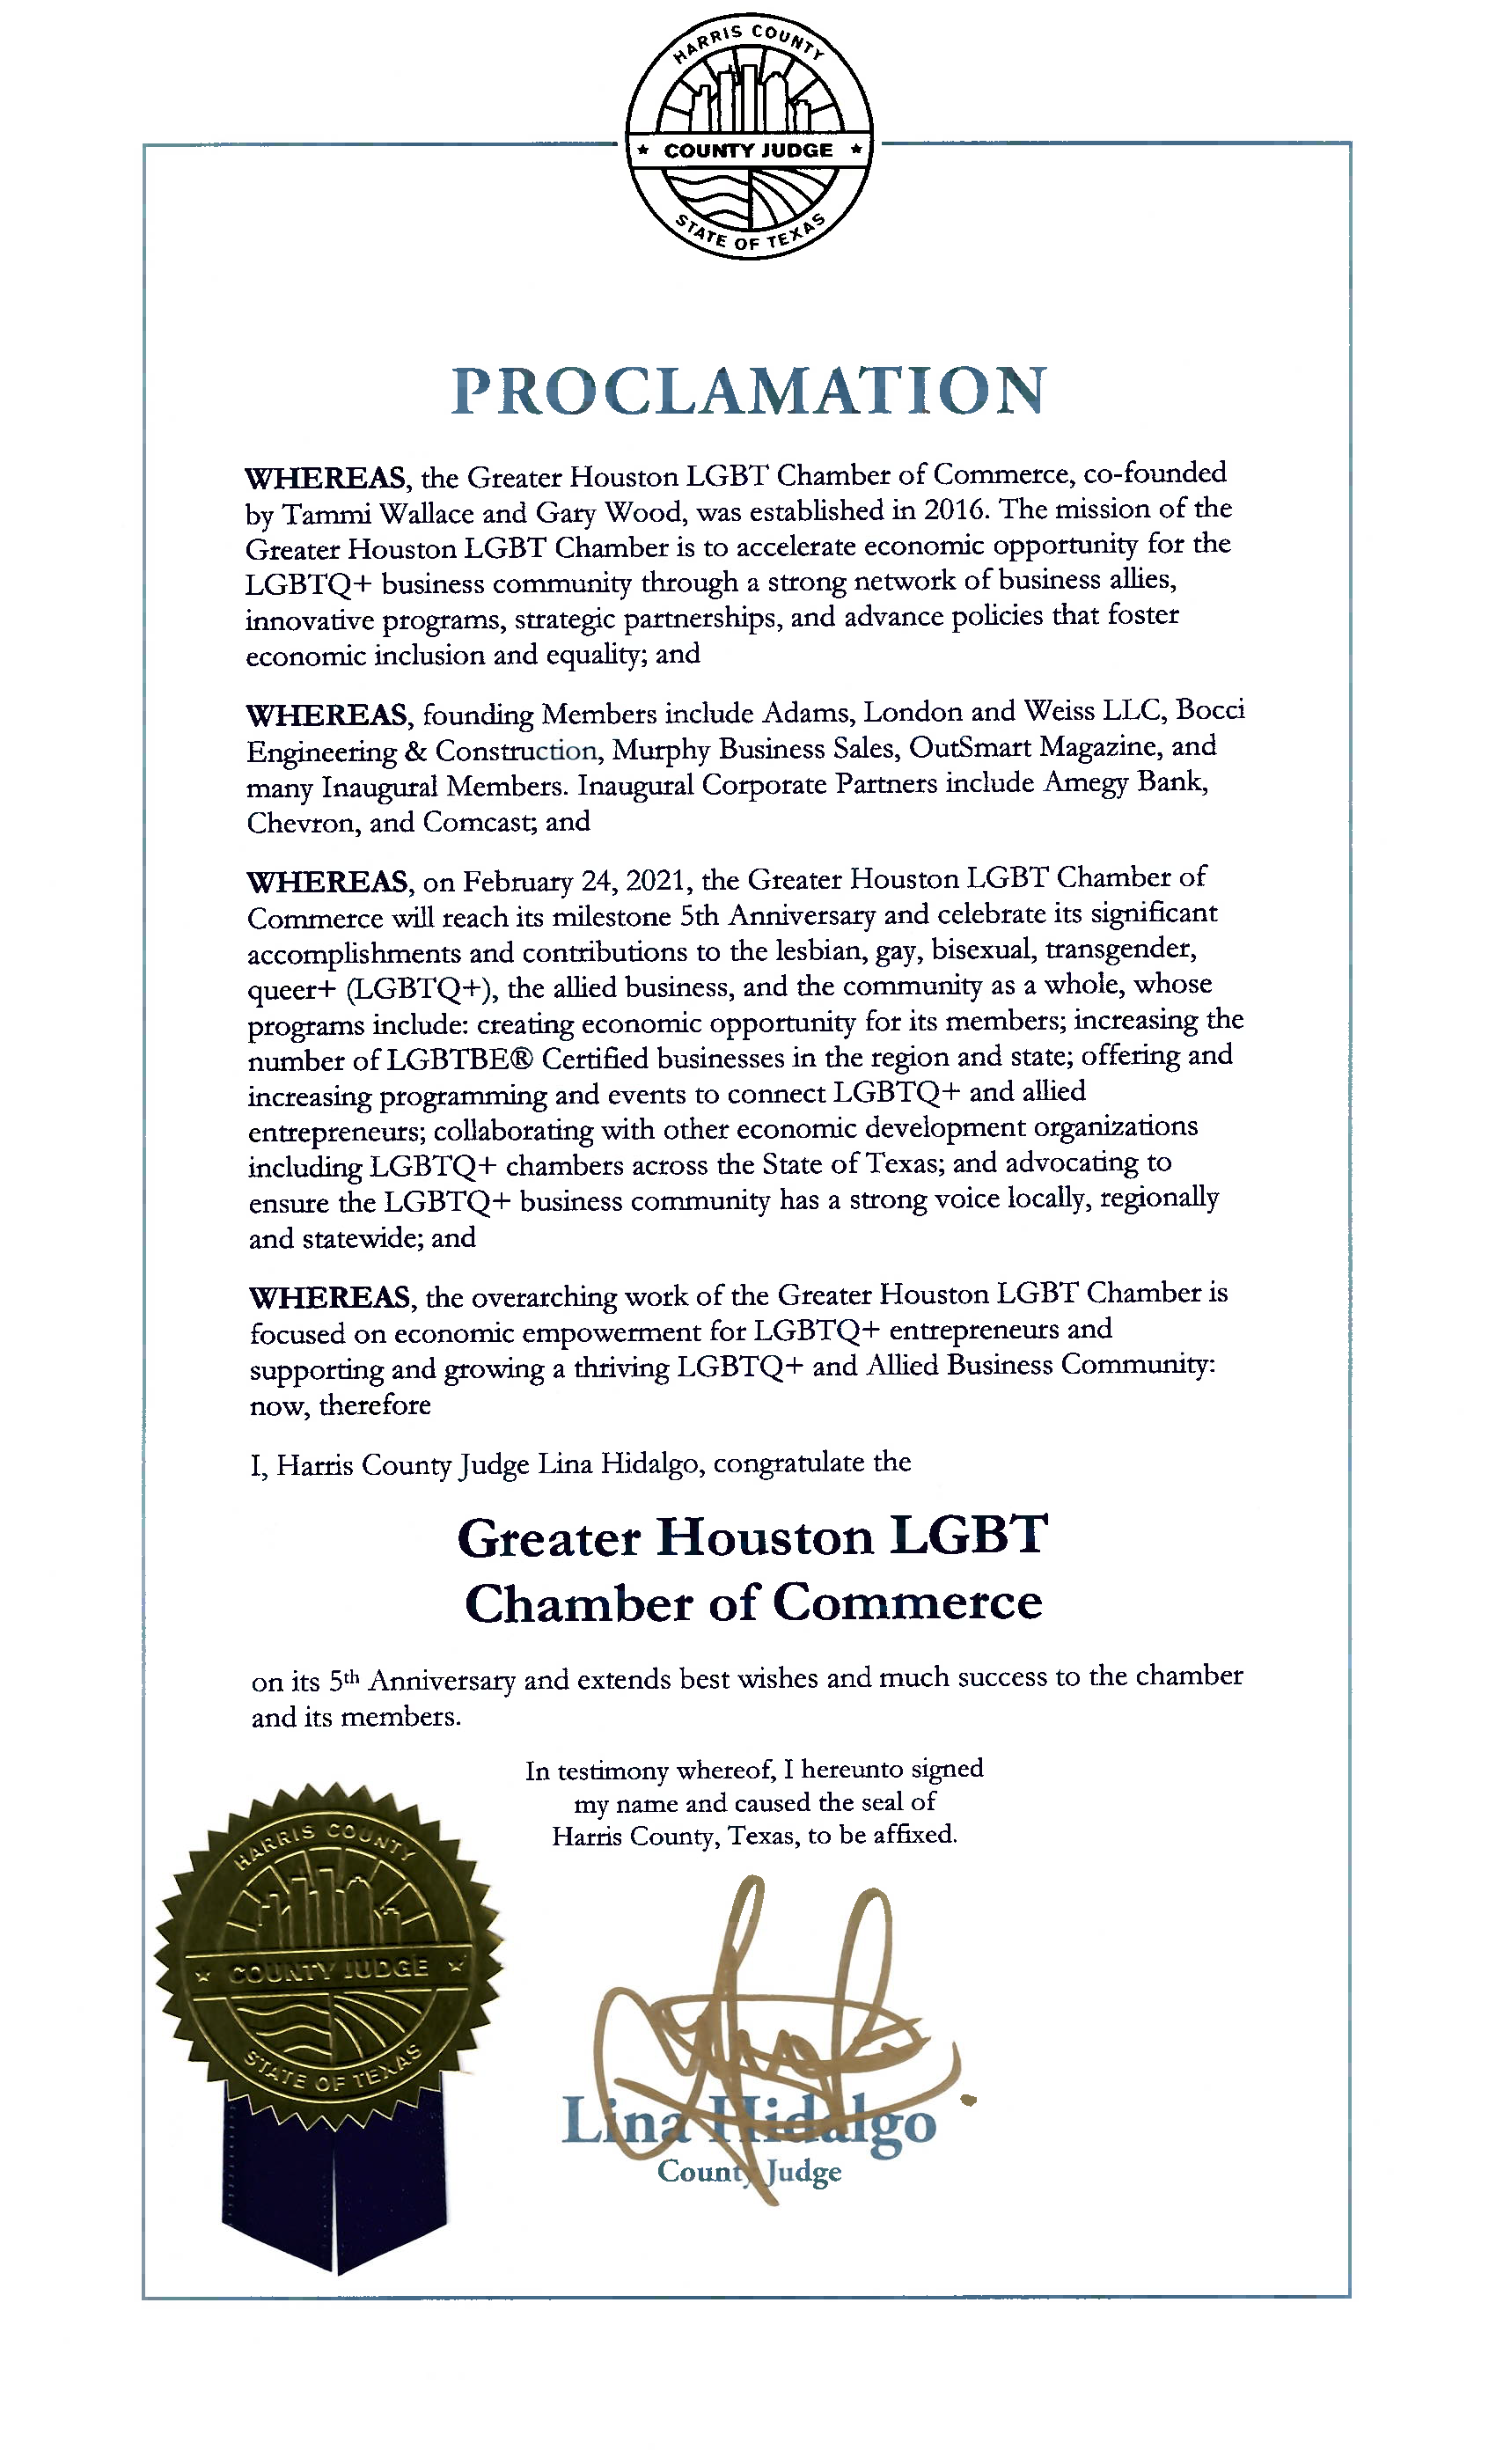 Harris County 5 Year Anniversary Proclamation